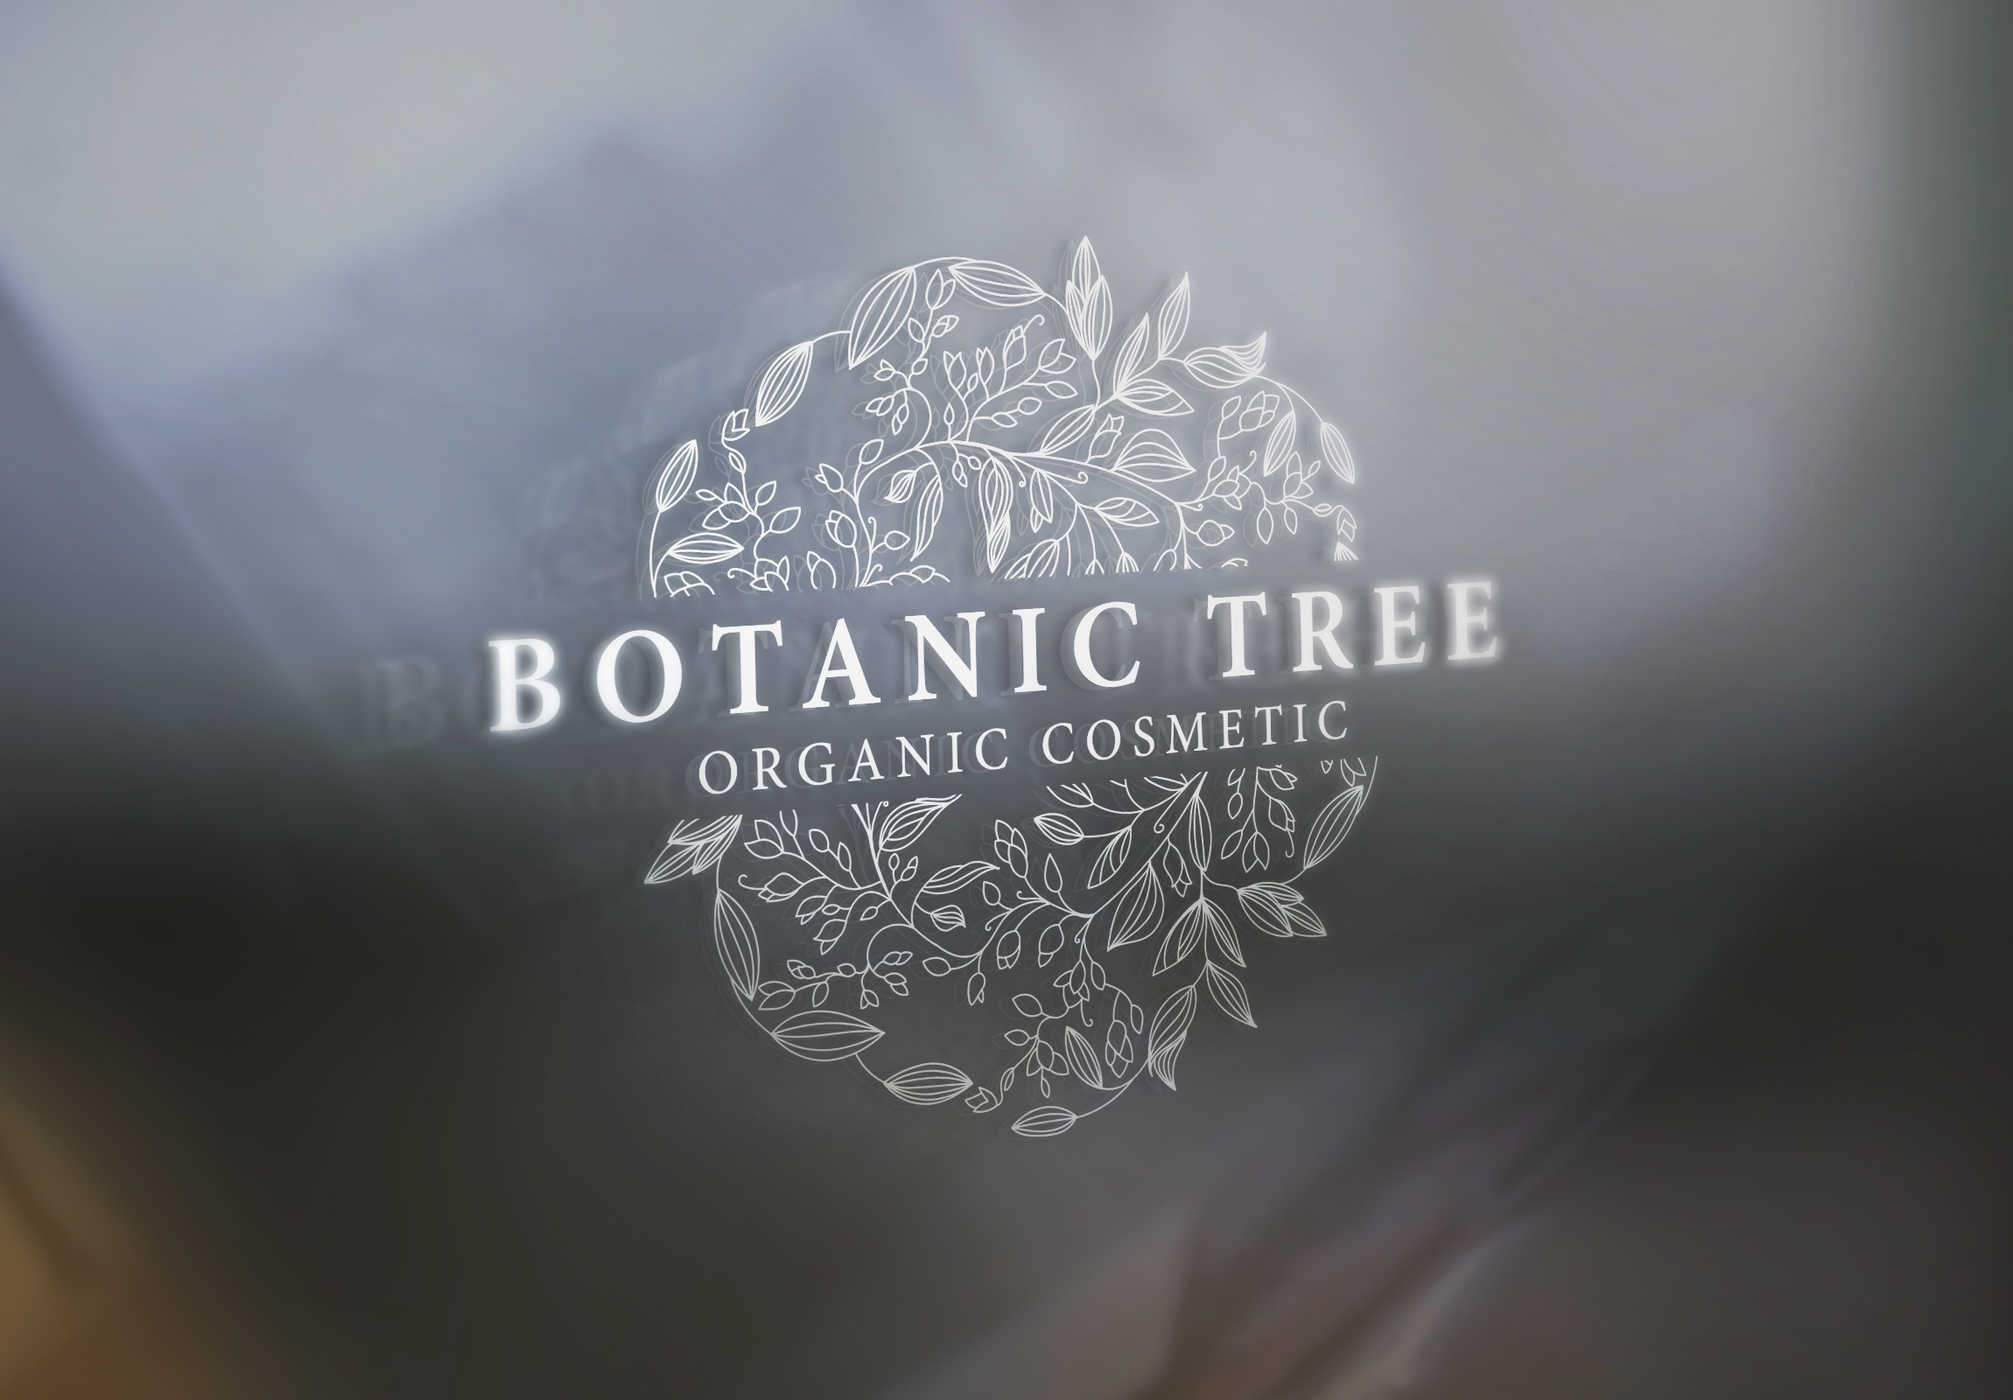 Botanic Tree